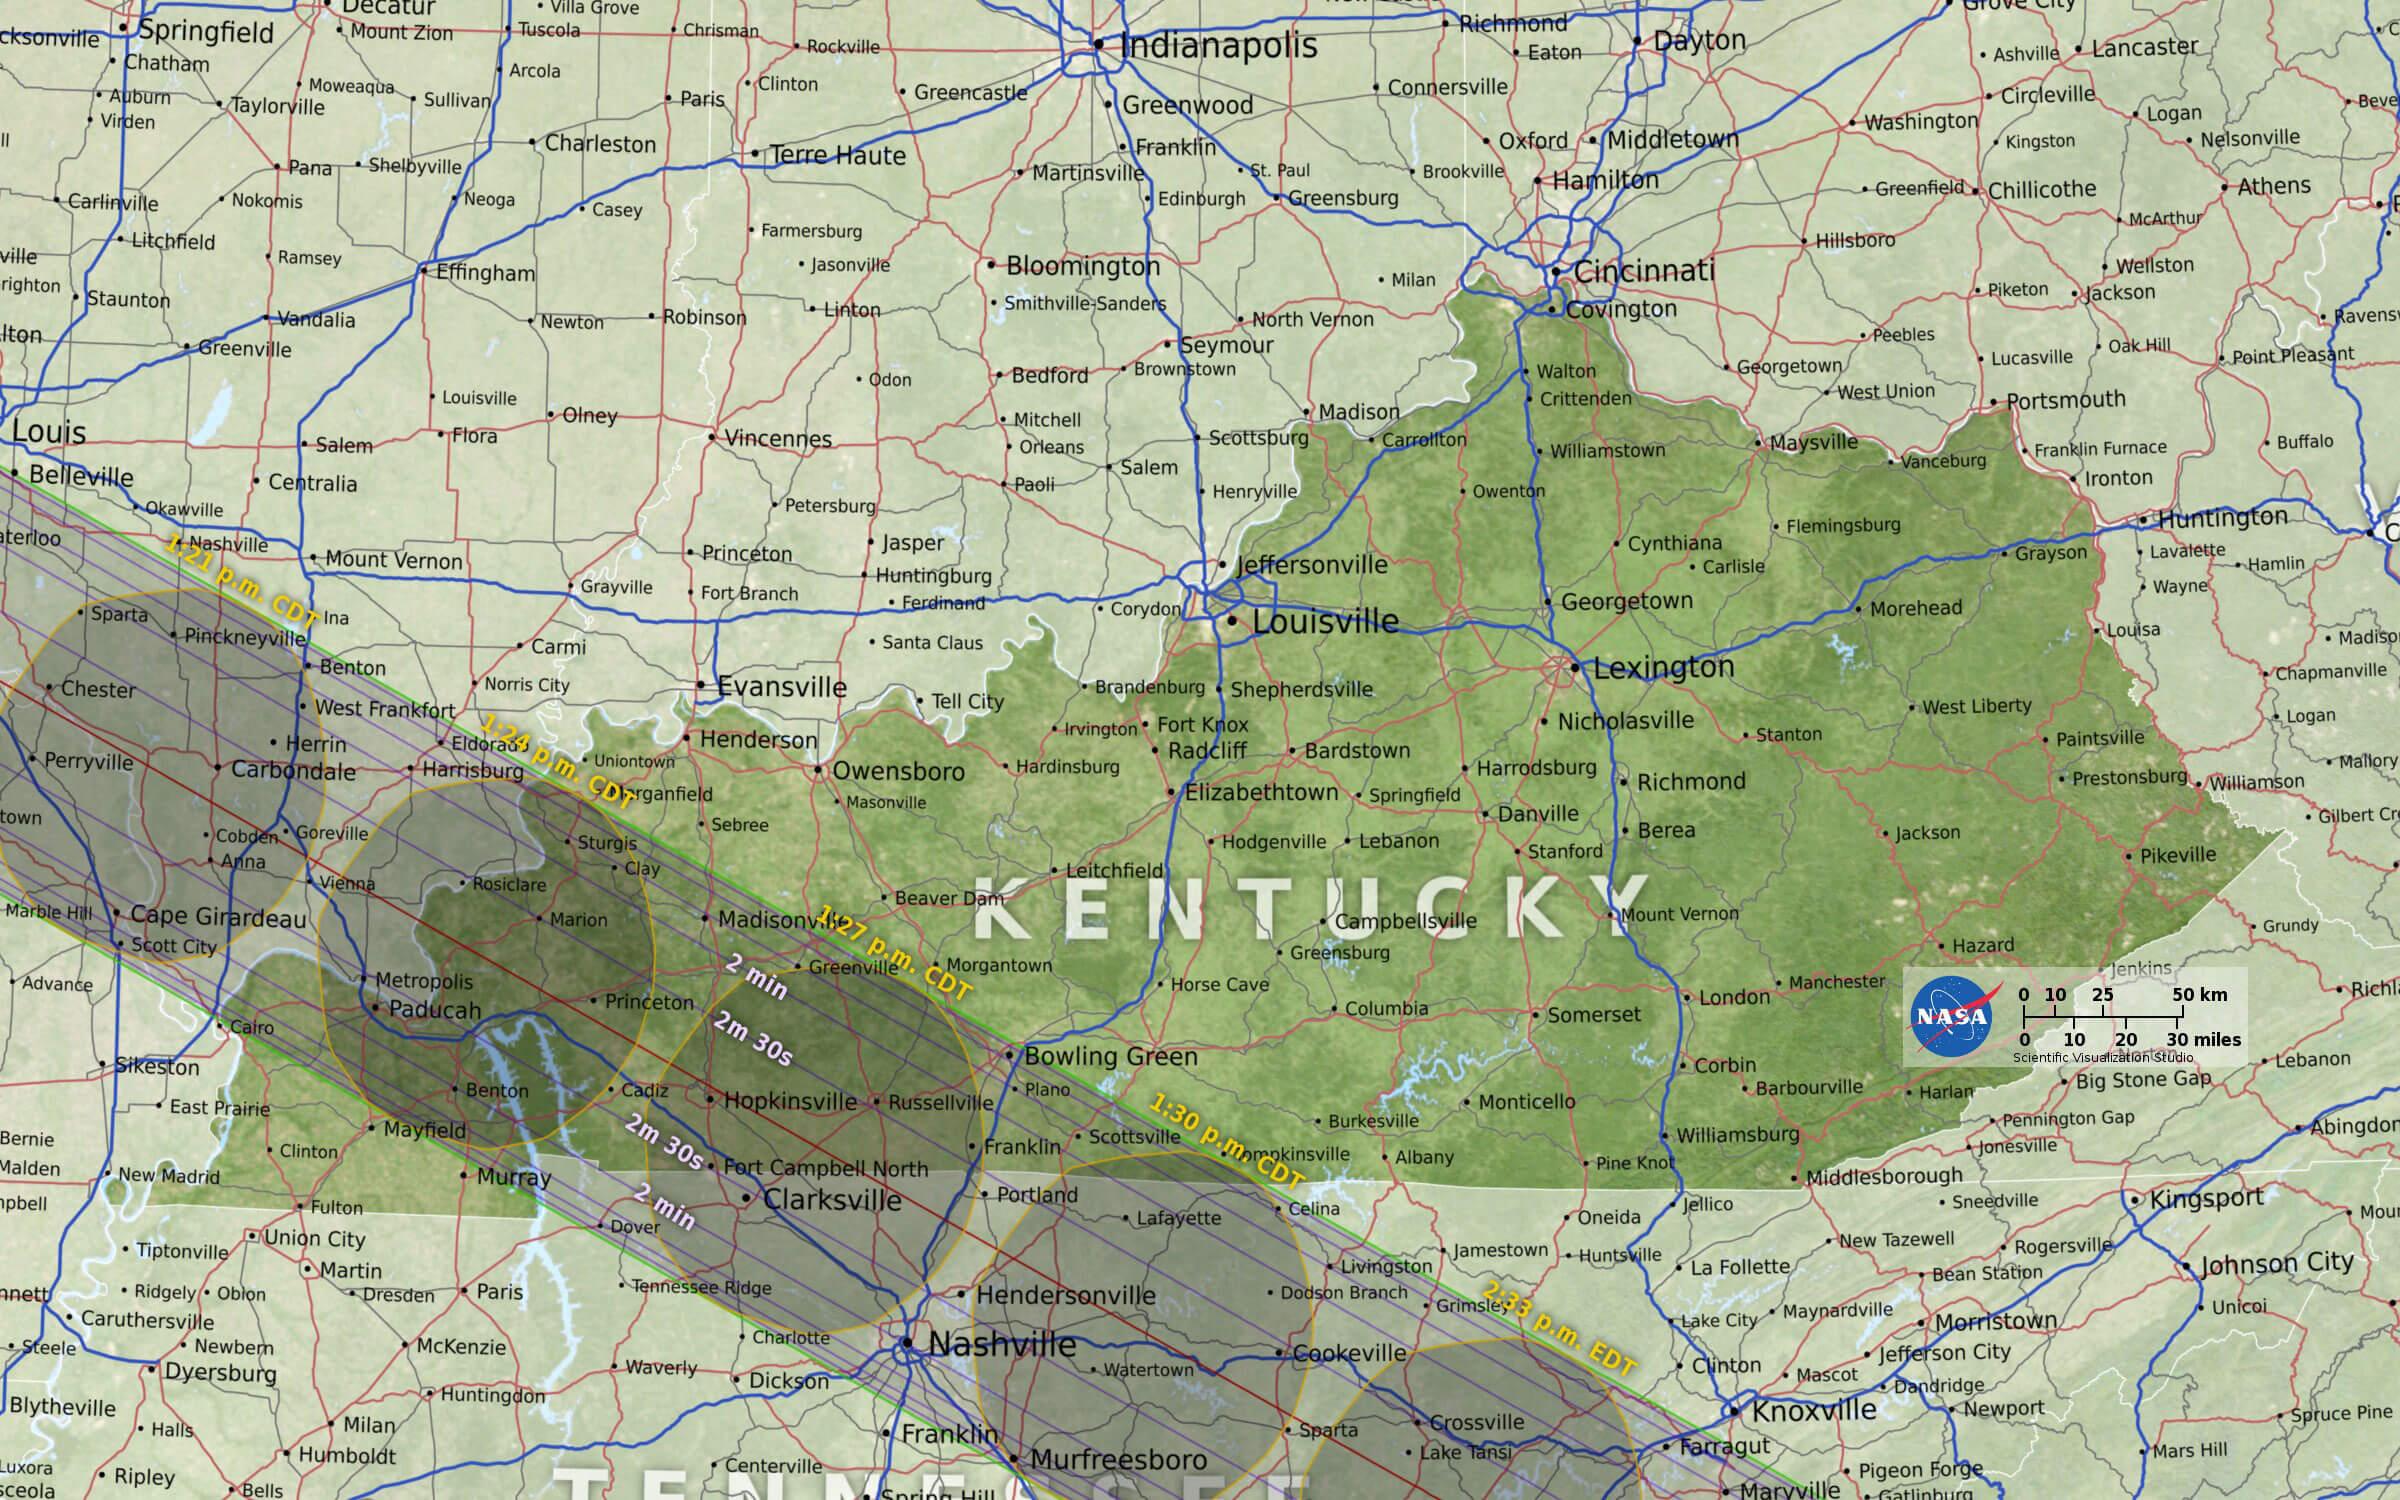 Eclipse Maps | Total Solar Eclipse 2017 on black kentucky map, funny kentucky map, cartoon kentucky map, print kentucky map, 3d kentucky flag, 3d kentucky outline, 3d kentucky poster, hd kentucky map,